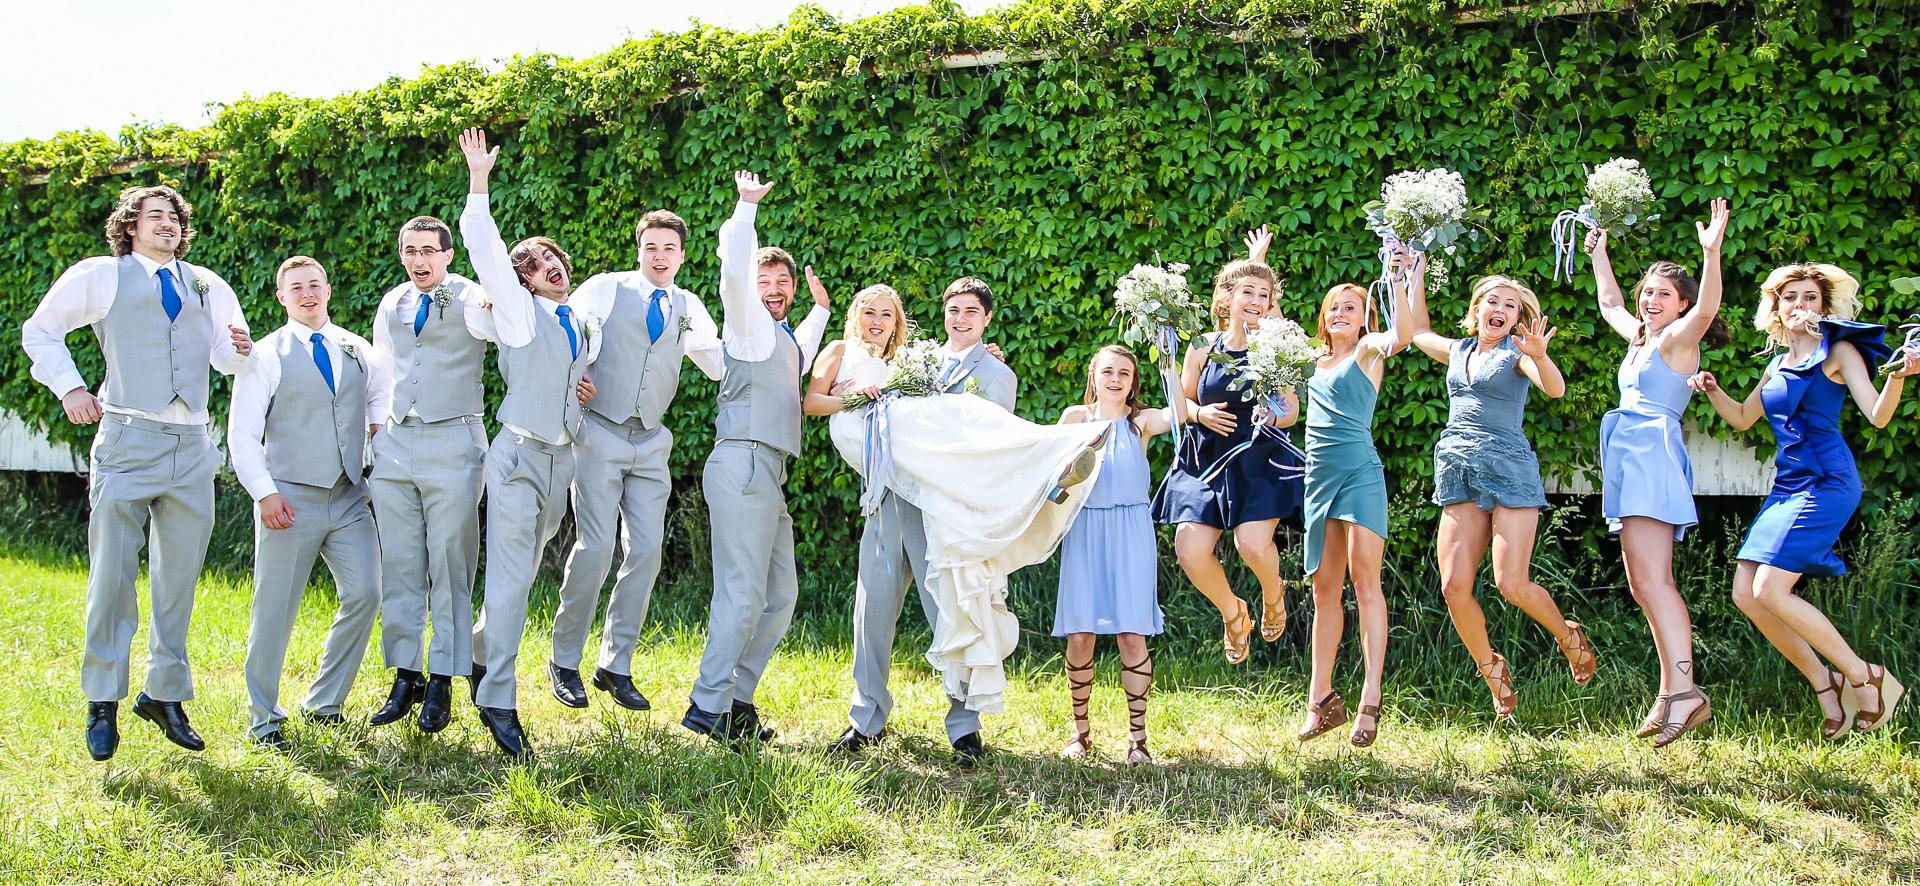 Jordan + Kevin Wedding On Sunny Slope Farm Wedding Venue by Linda Hexter Photography (20 of 30)